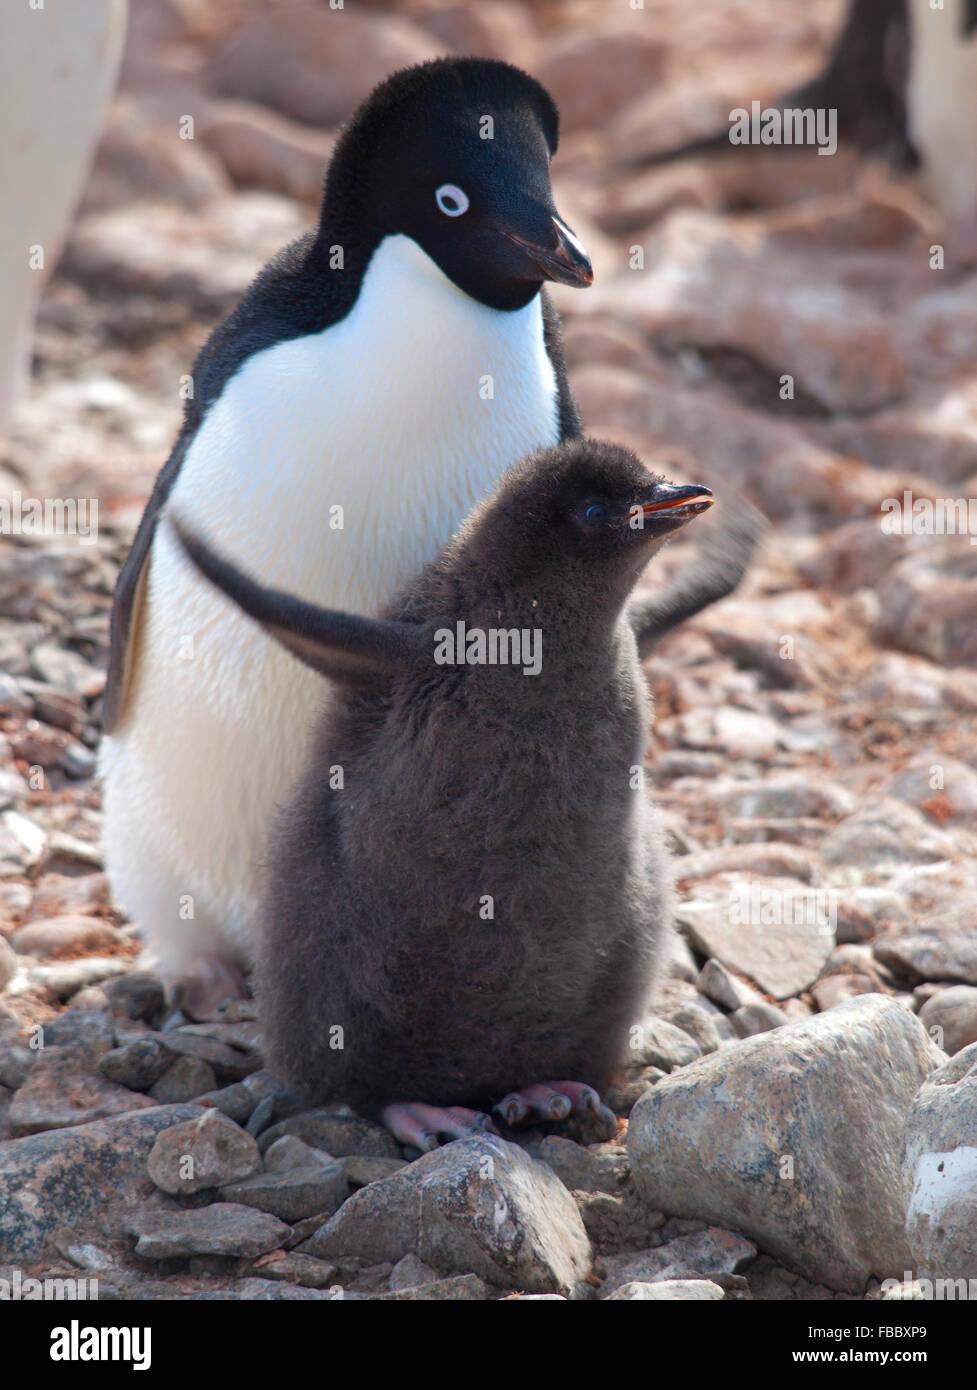 Adelie penguin parent and chick, Antarctic Peninsula - Stock Image